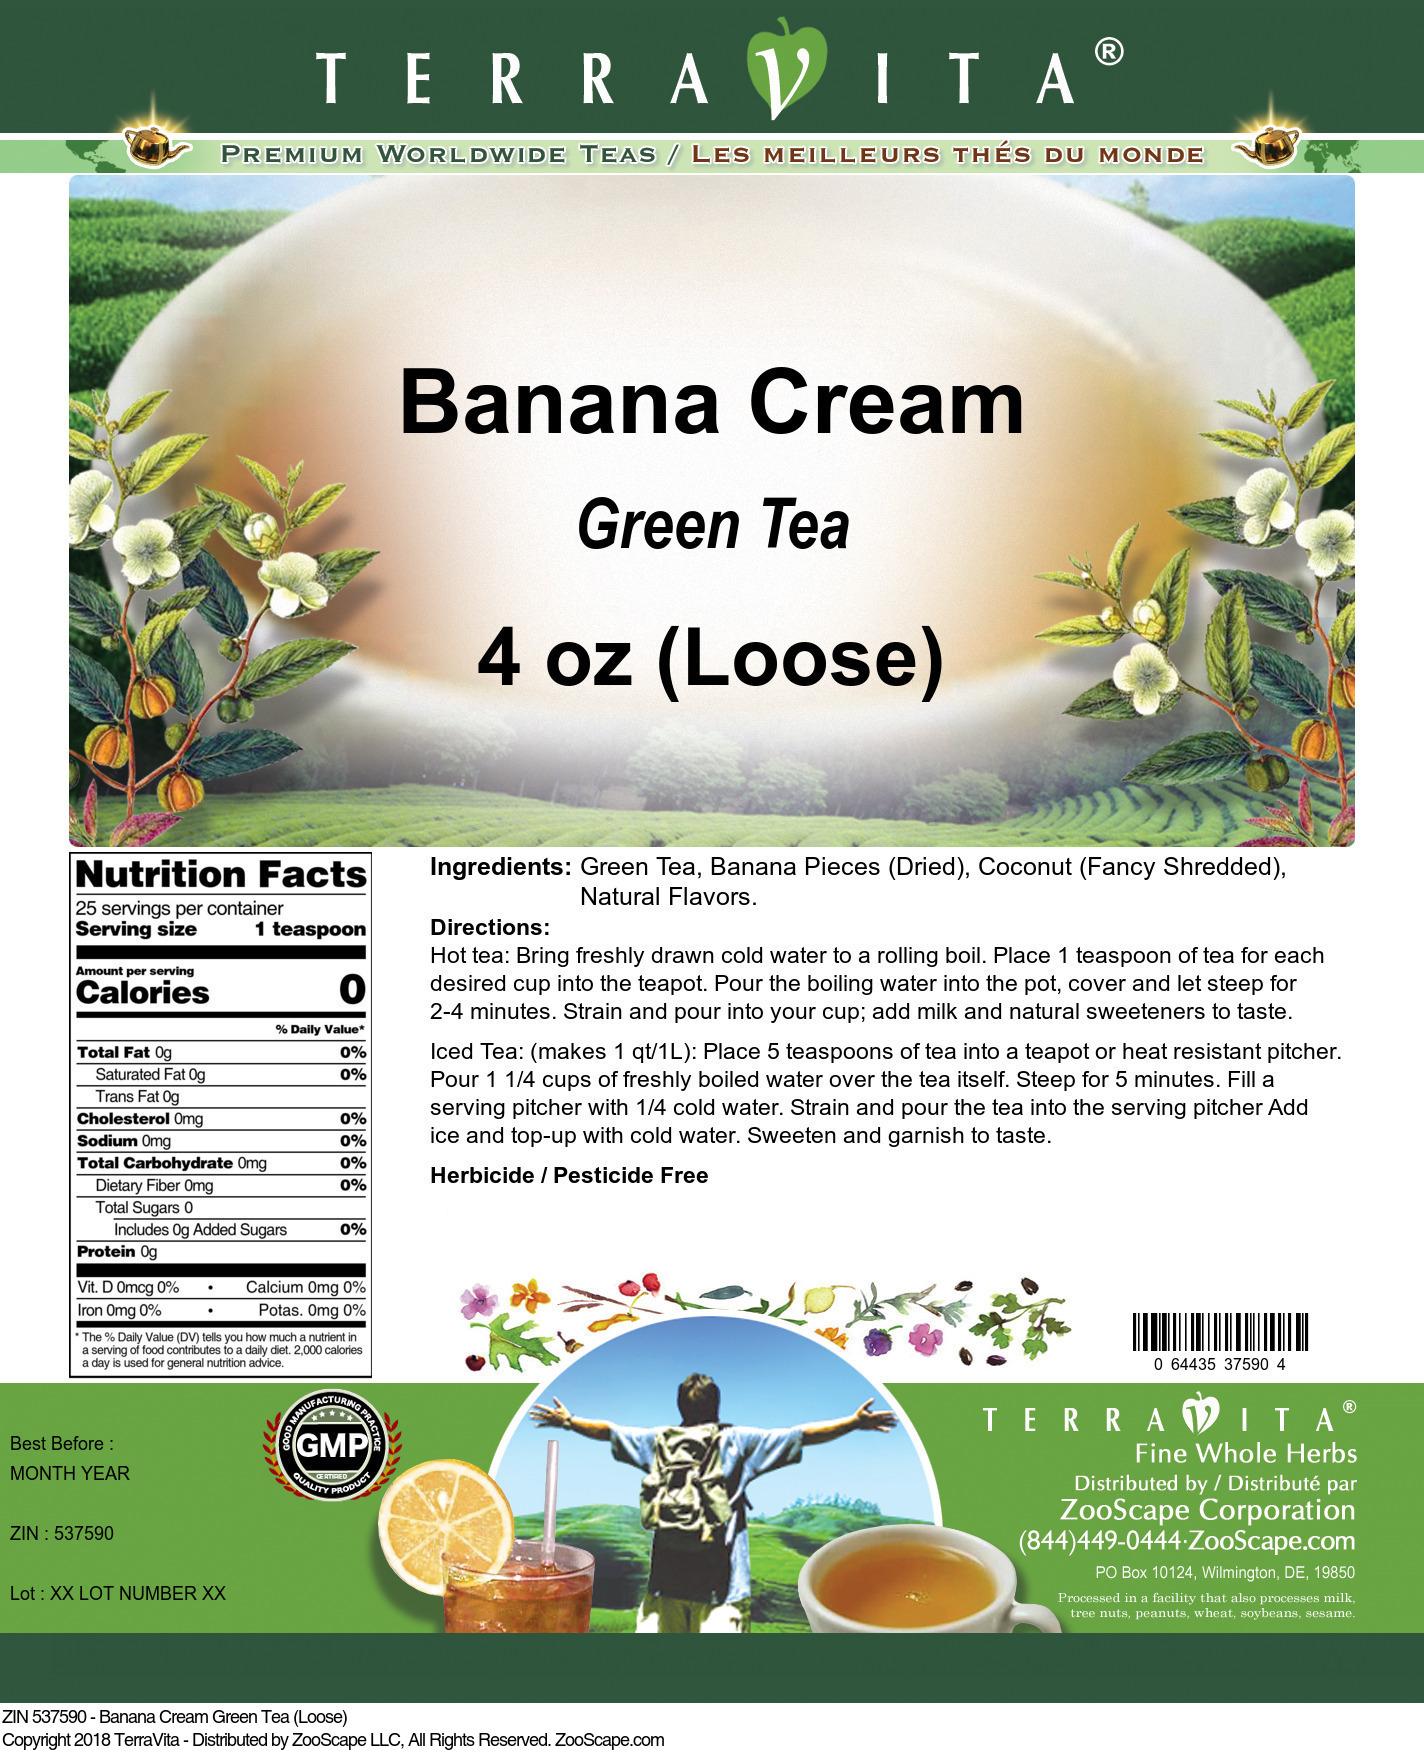 Banana Cream Green Tea (Loose)